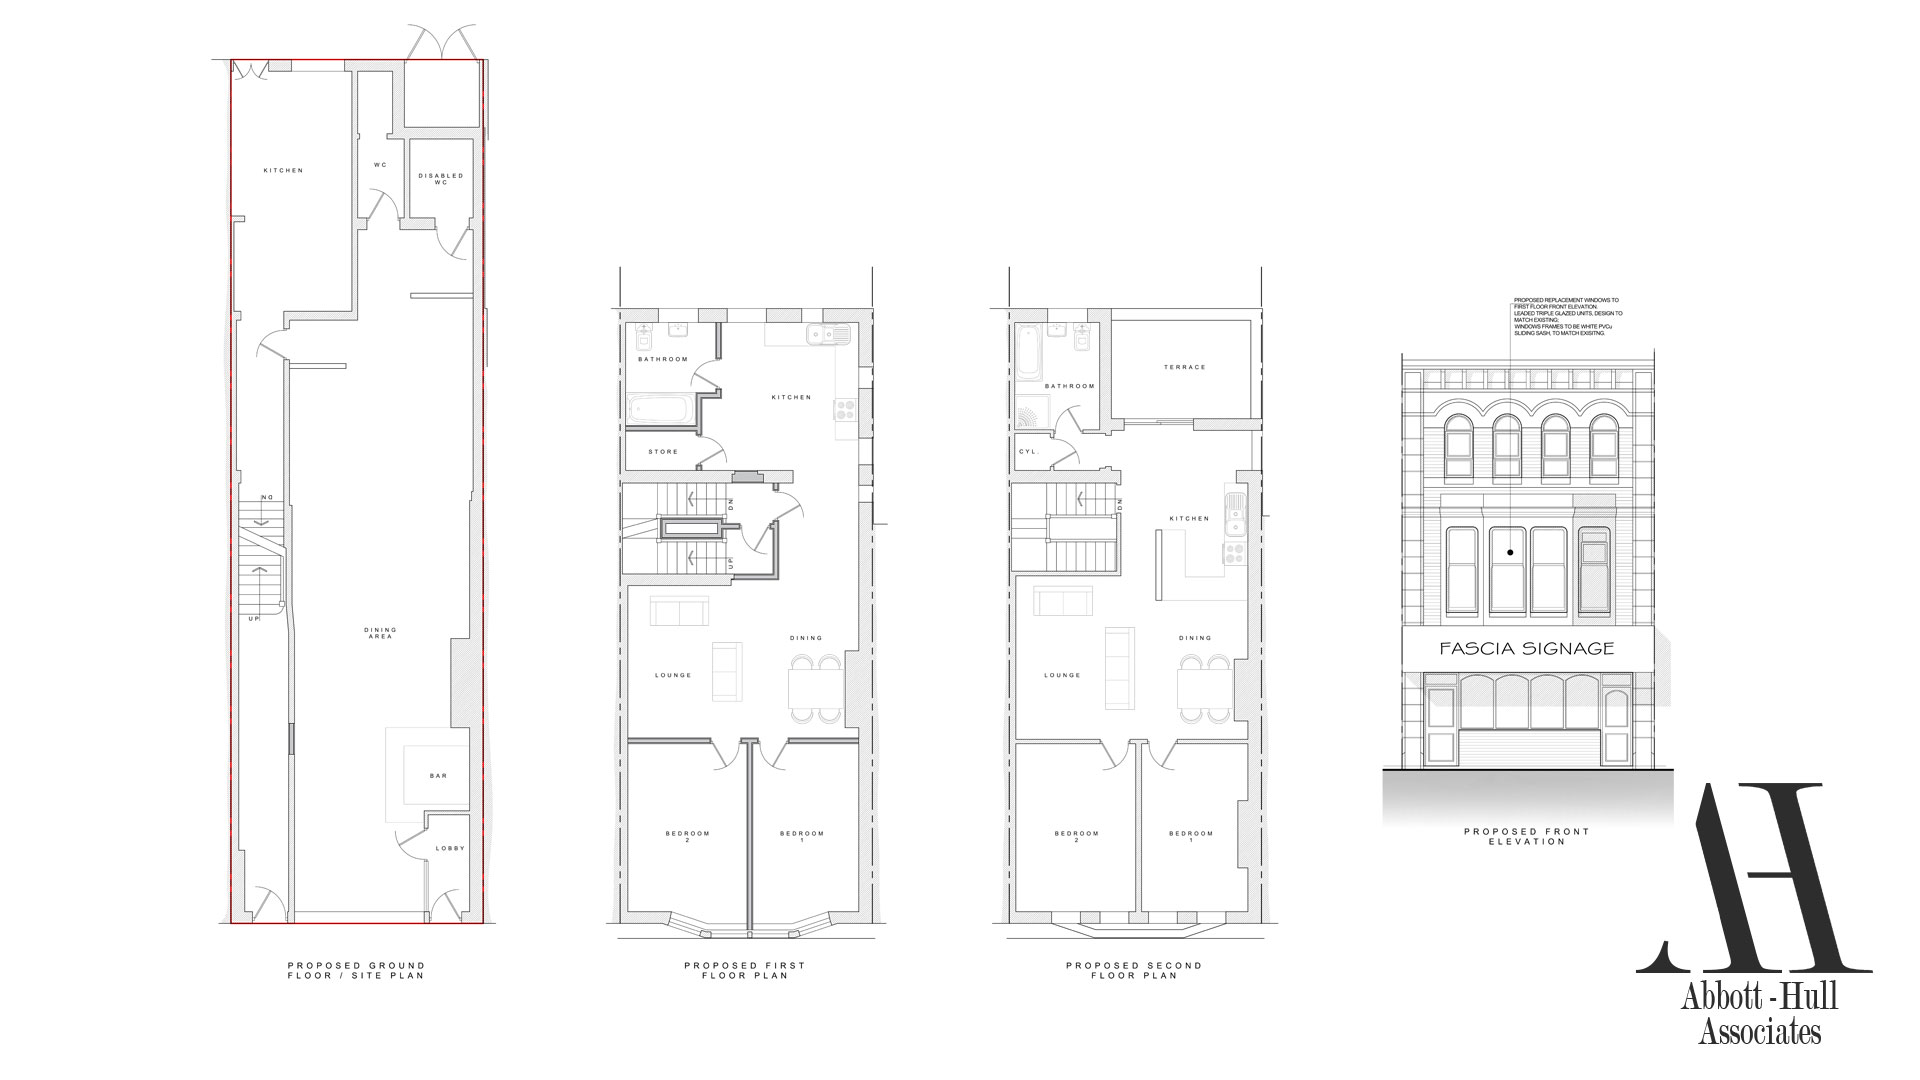 25 North Albert Street, Fleetwood - Proposed Plans